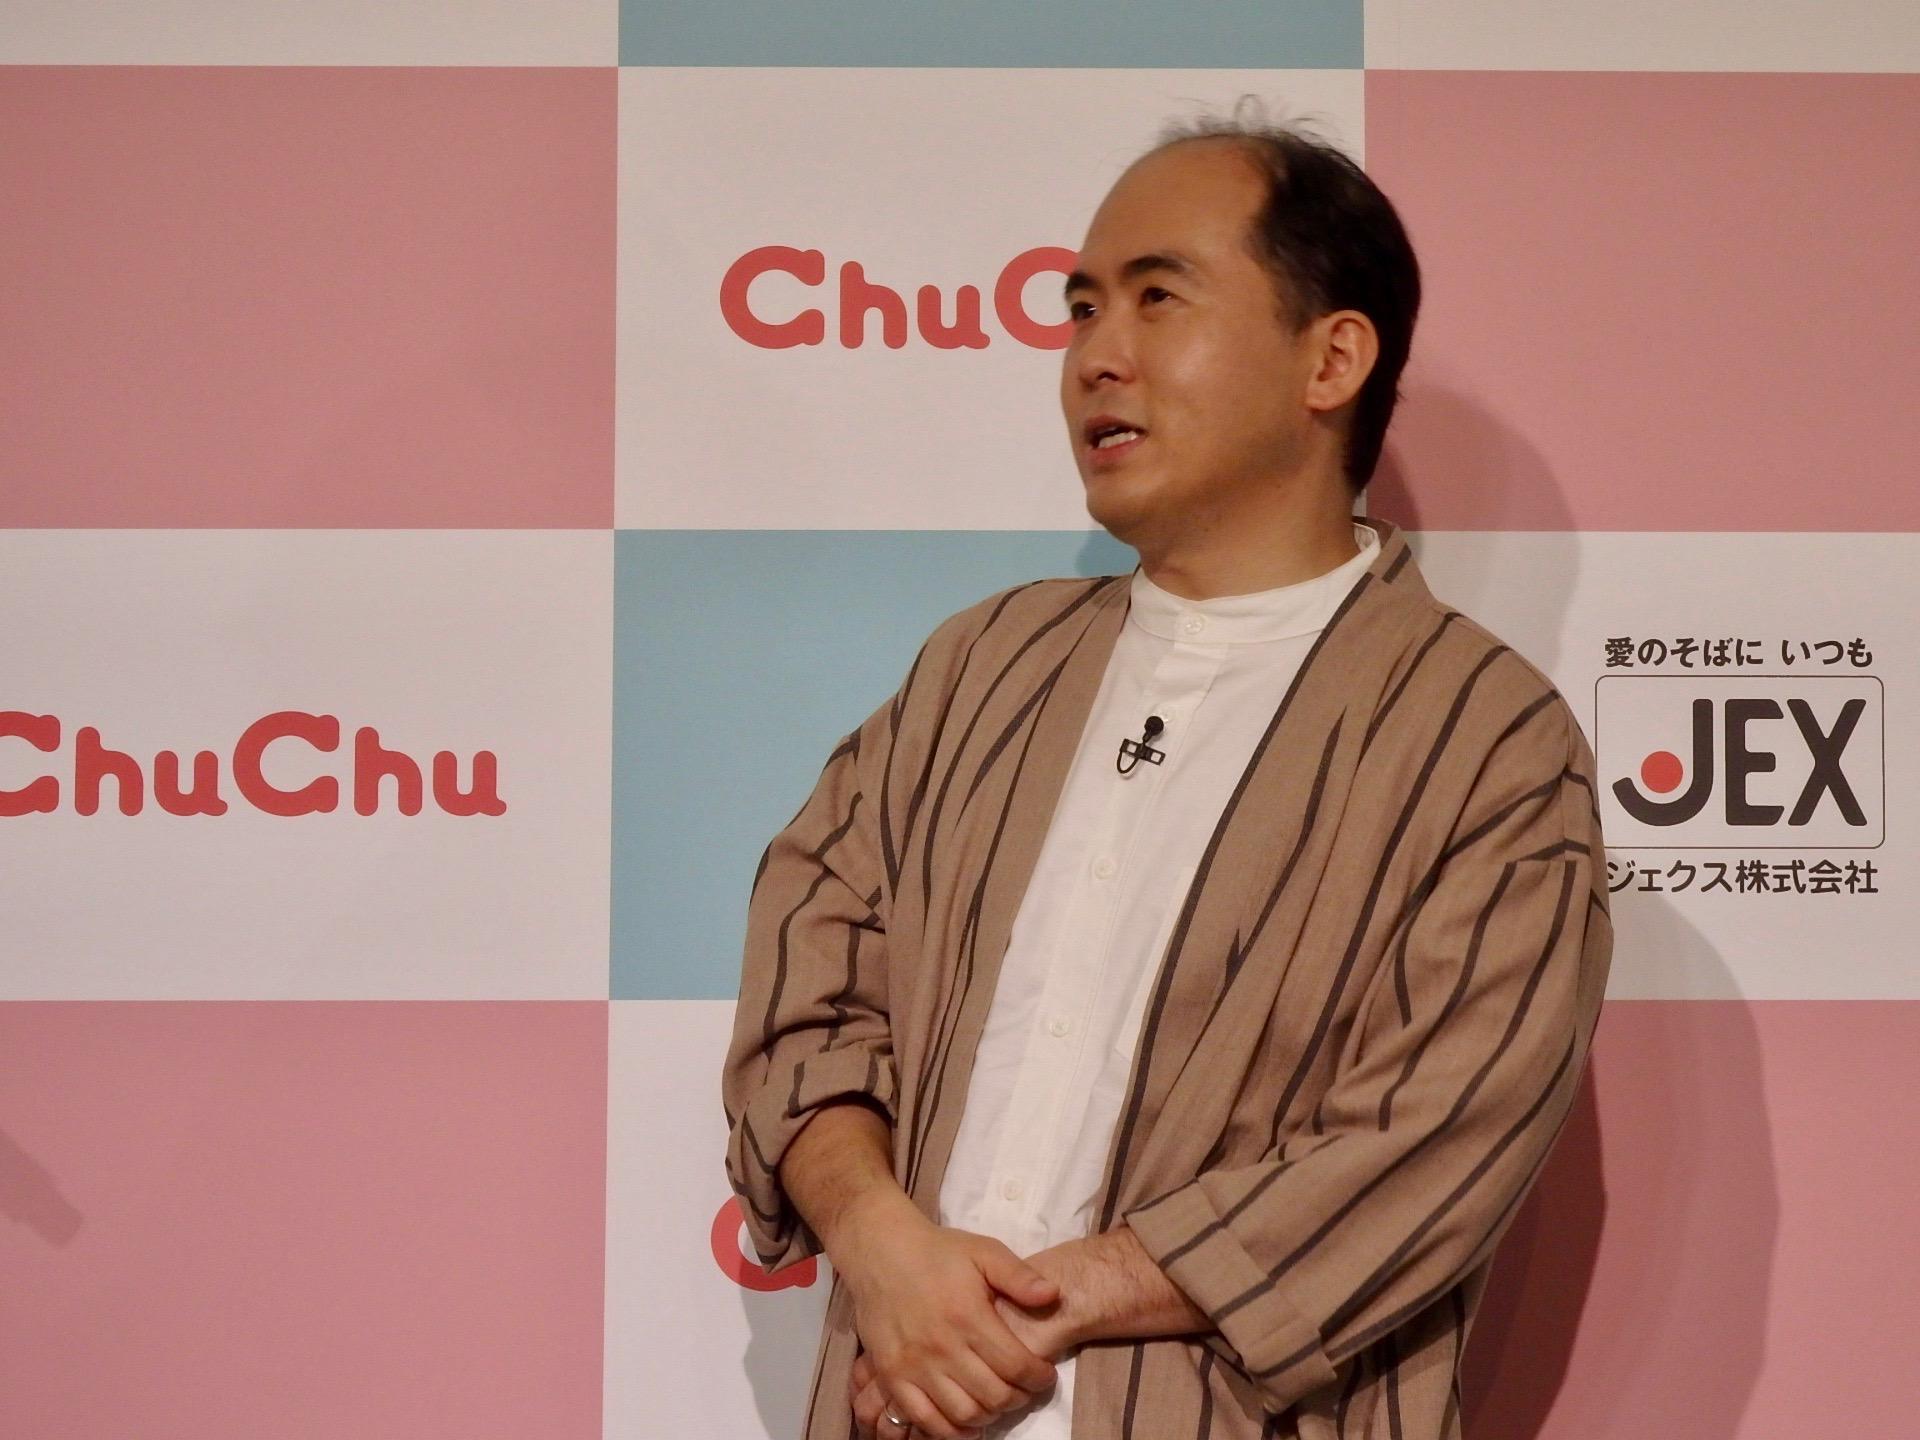 http://news.yoshimoto.co.jp/20180929173409-0353088d9a0d3b200036a7903a505648e3935fa0.jpg